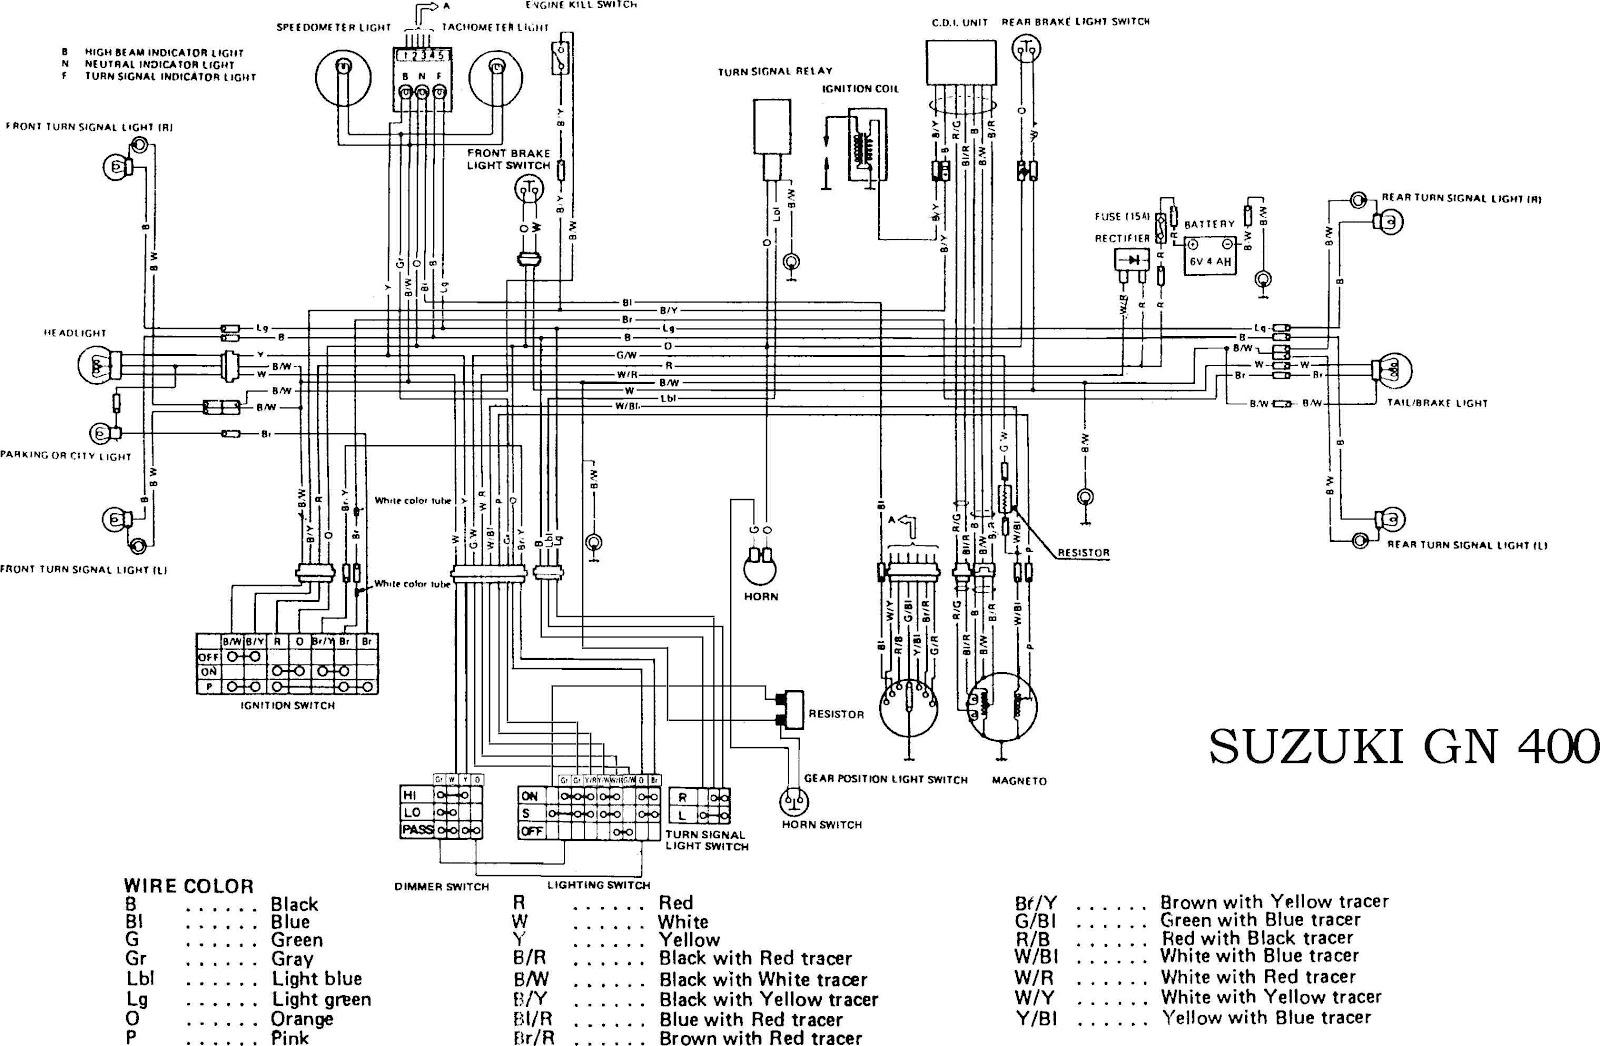 Suzuki+GN400+motorcycle+Complete+Electrical+Wiring+Diagram?resize\=665%2C435 suzuki gn 125 wiring diagram suzuki 125 three wheeler \u2022 wiring 2003 suzuki katana 600 wiring diagram at virtualis.co